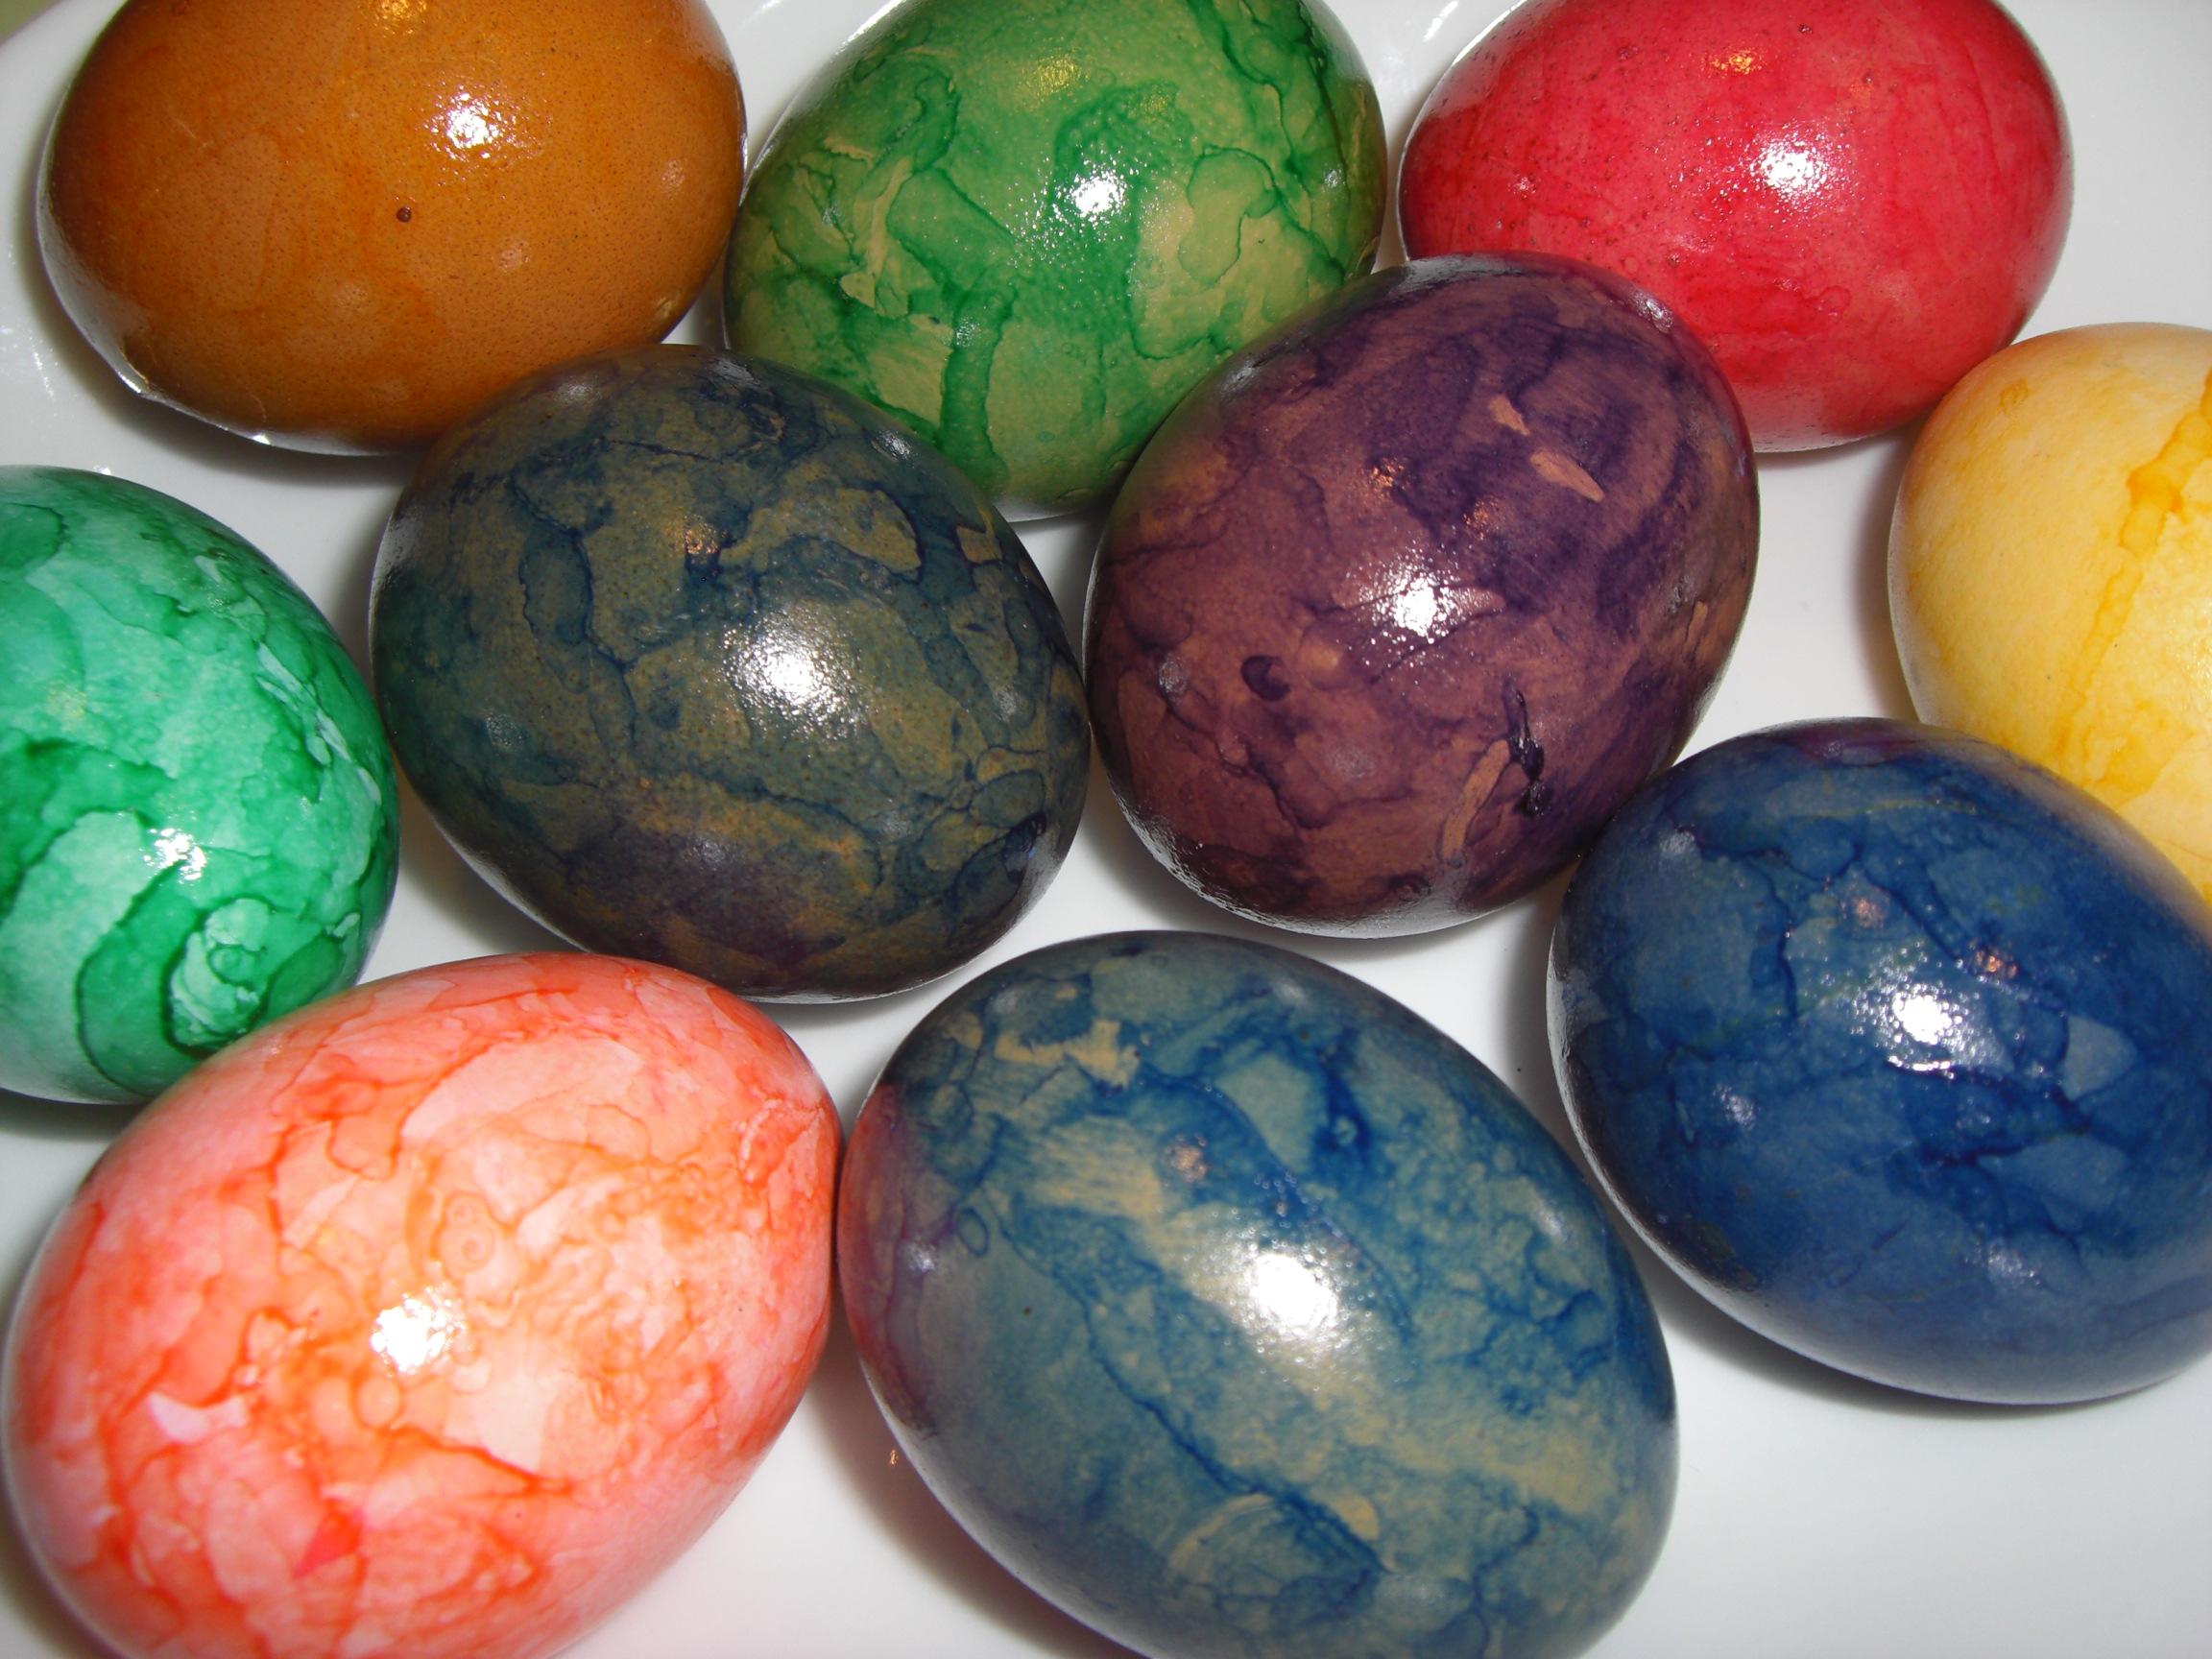 Ostereier, bunte Eier, selber färben - krisenkueche.de